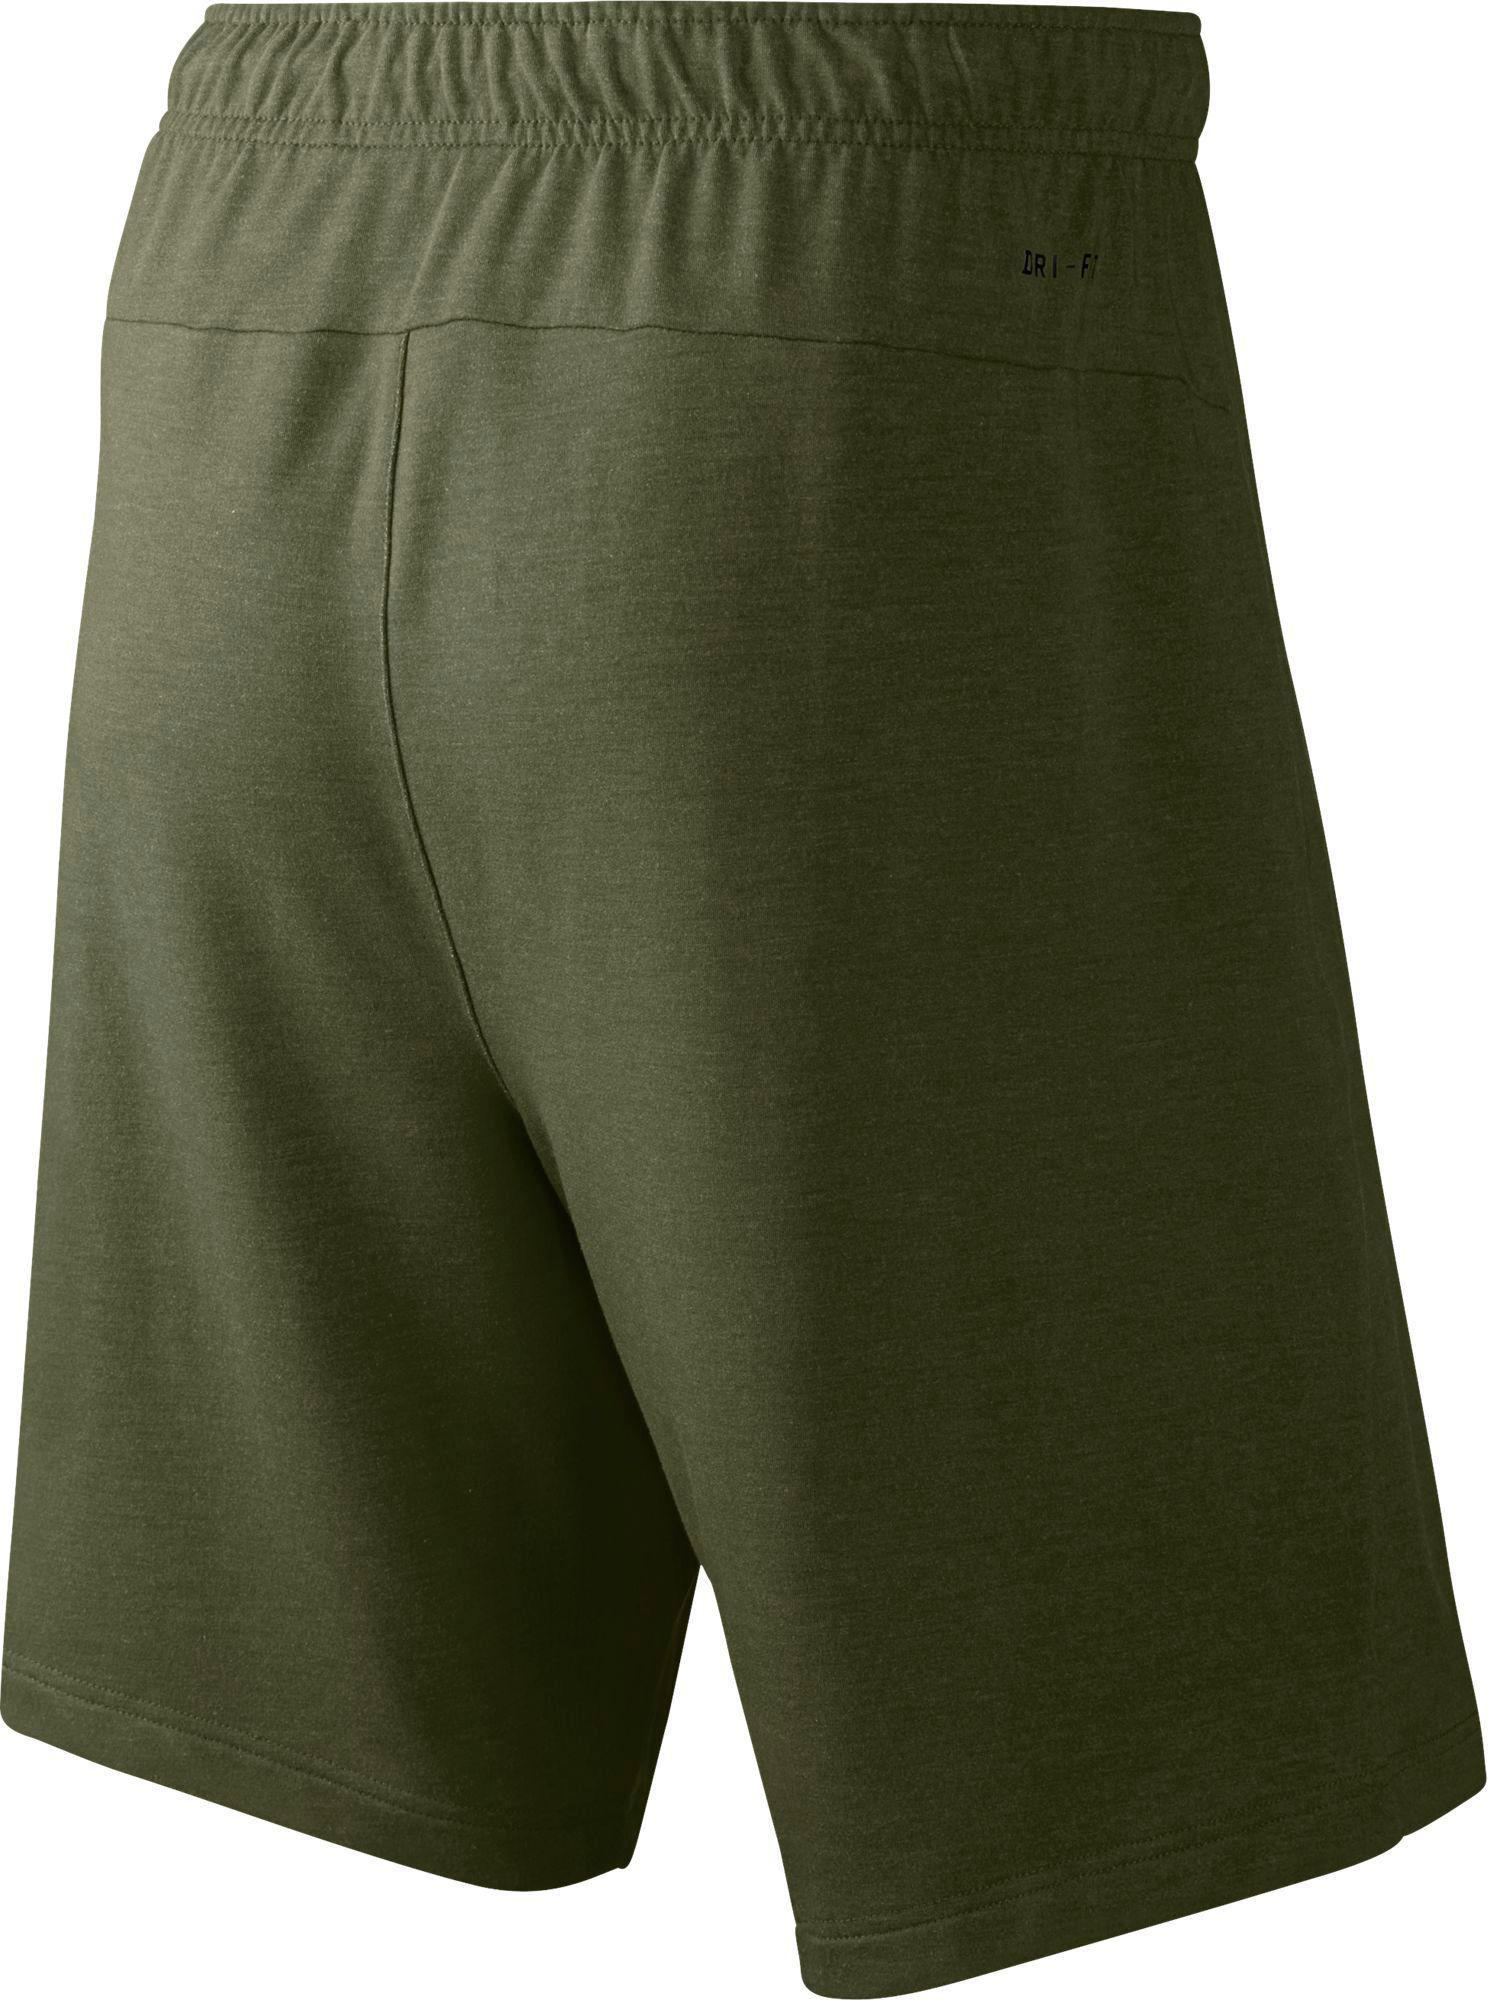 green nike fleece shorts